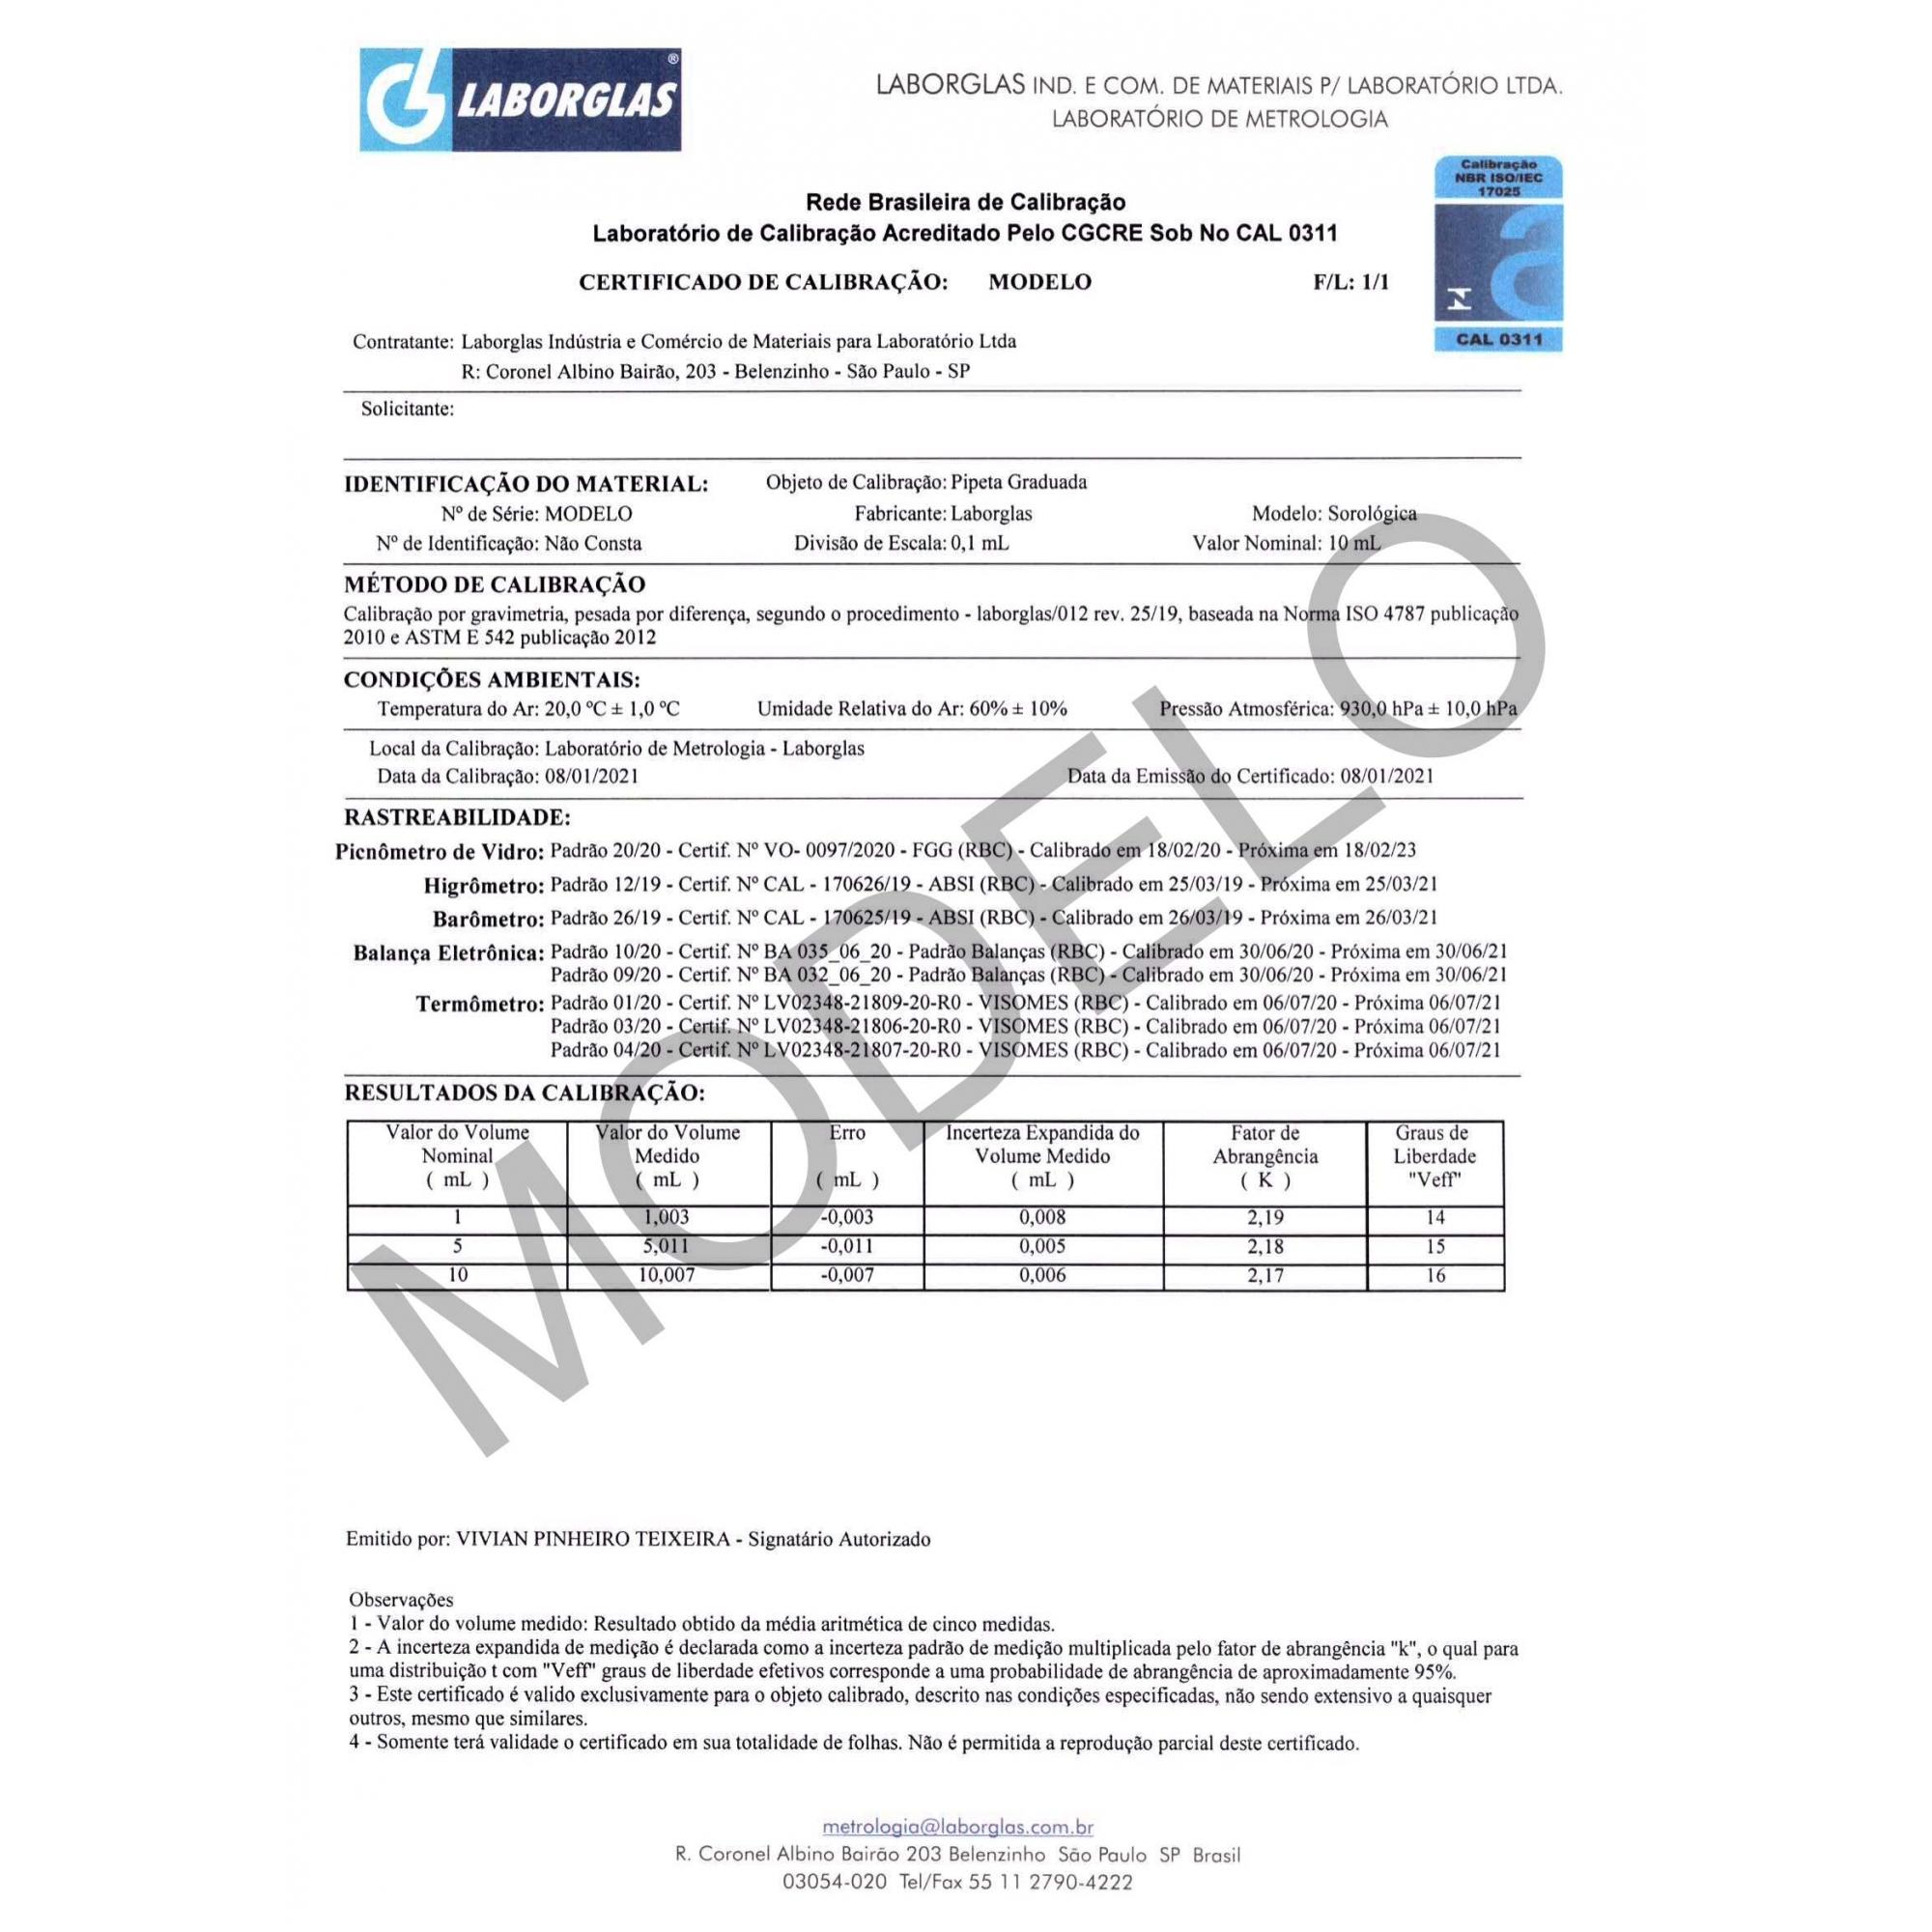 PIPETA GRAD. SOROL. ESGOT. TOTAL 10 ML 1/10 COM CERTIFICADO RBC - Laborglas - Cód. 9434311-R